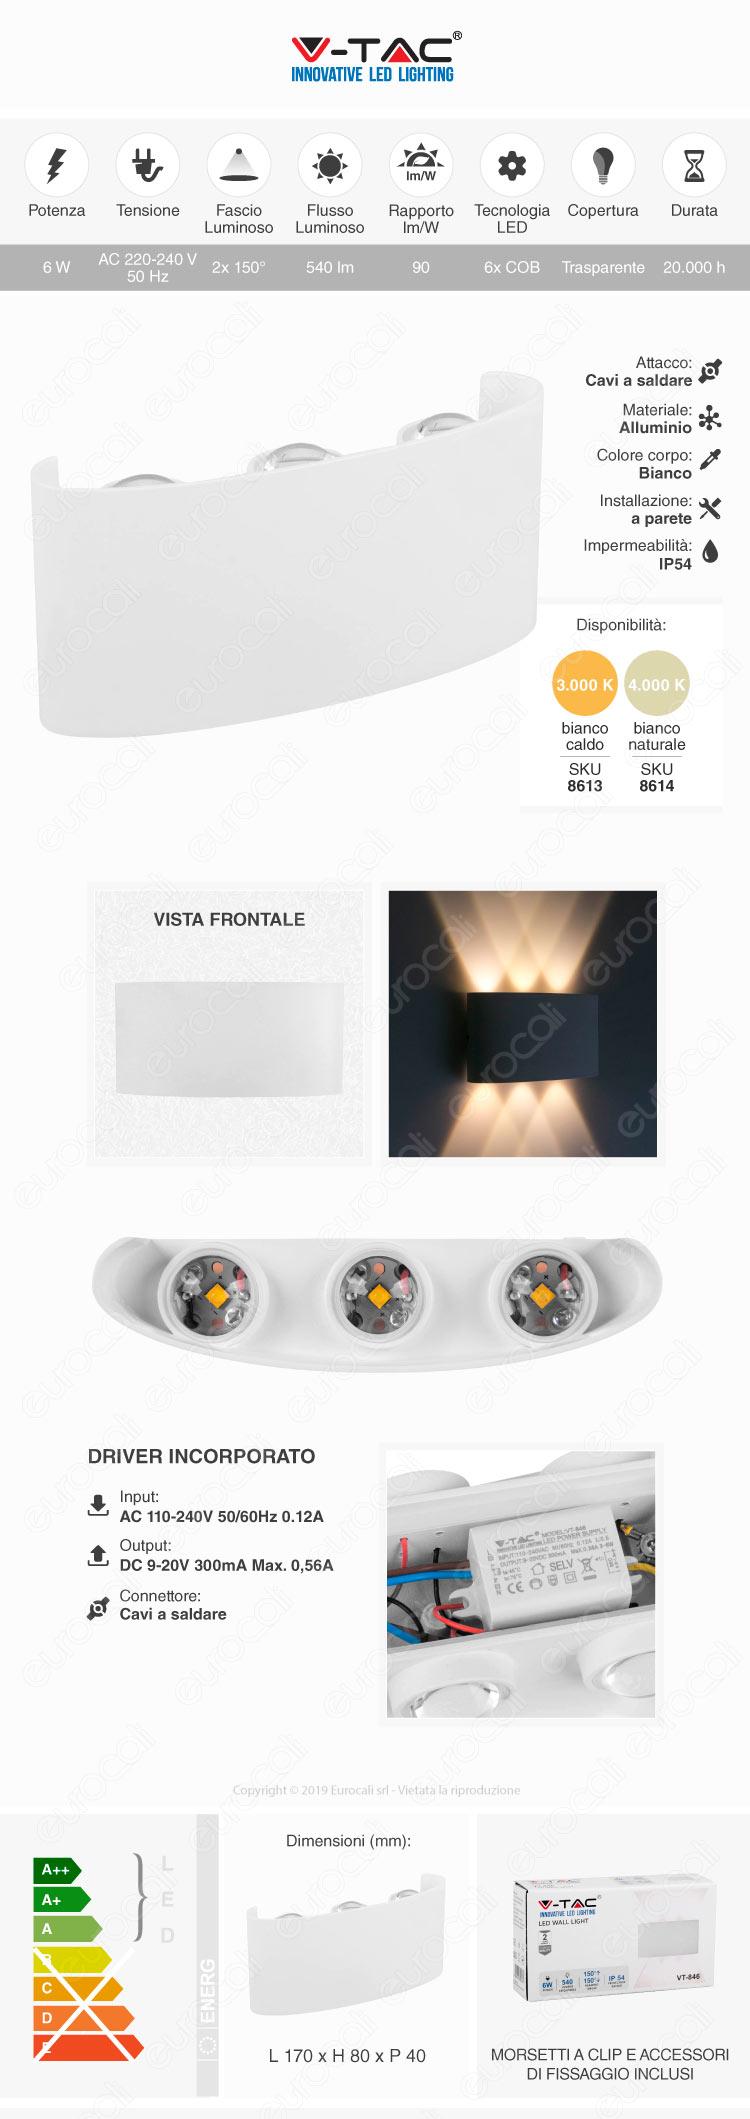 V-Tac VT-846 LED Wall Light 6W